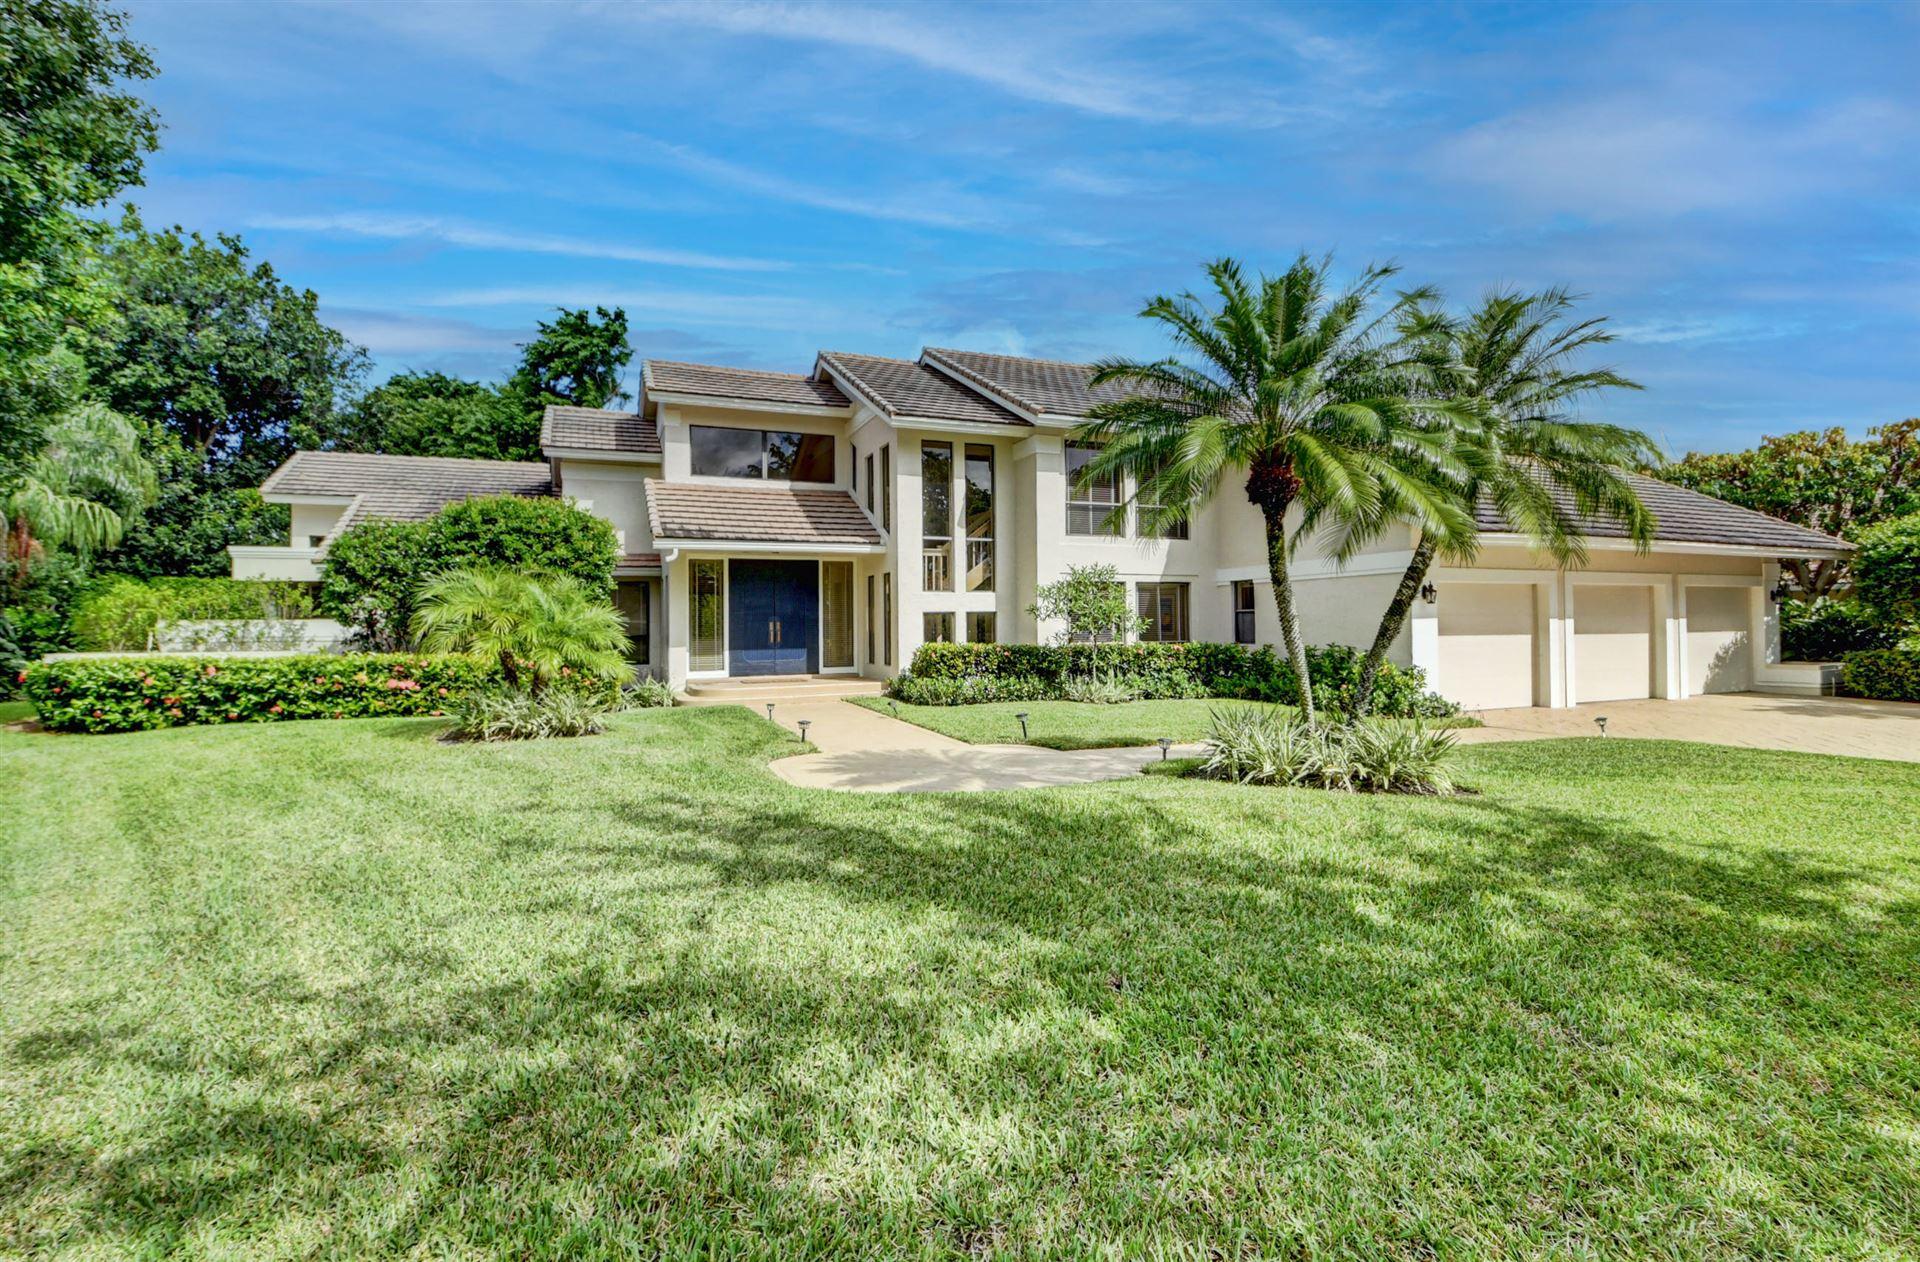 3275 S Saint Charles Way, Boca Raton, FL 33434 - #: RX-10751821